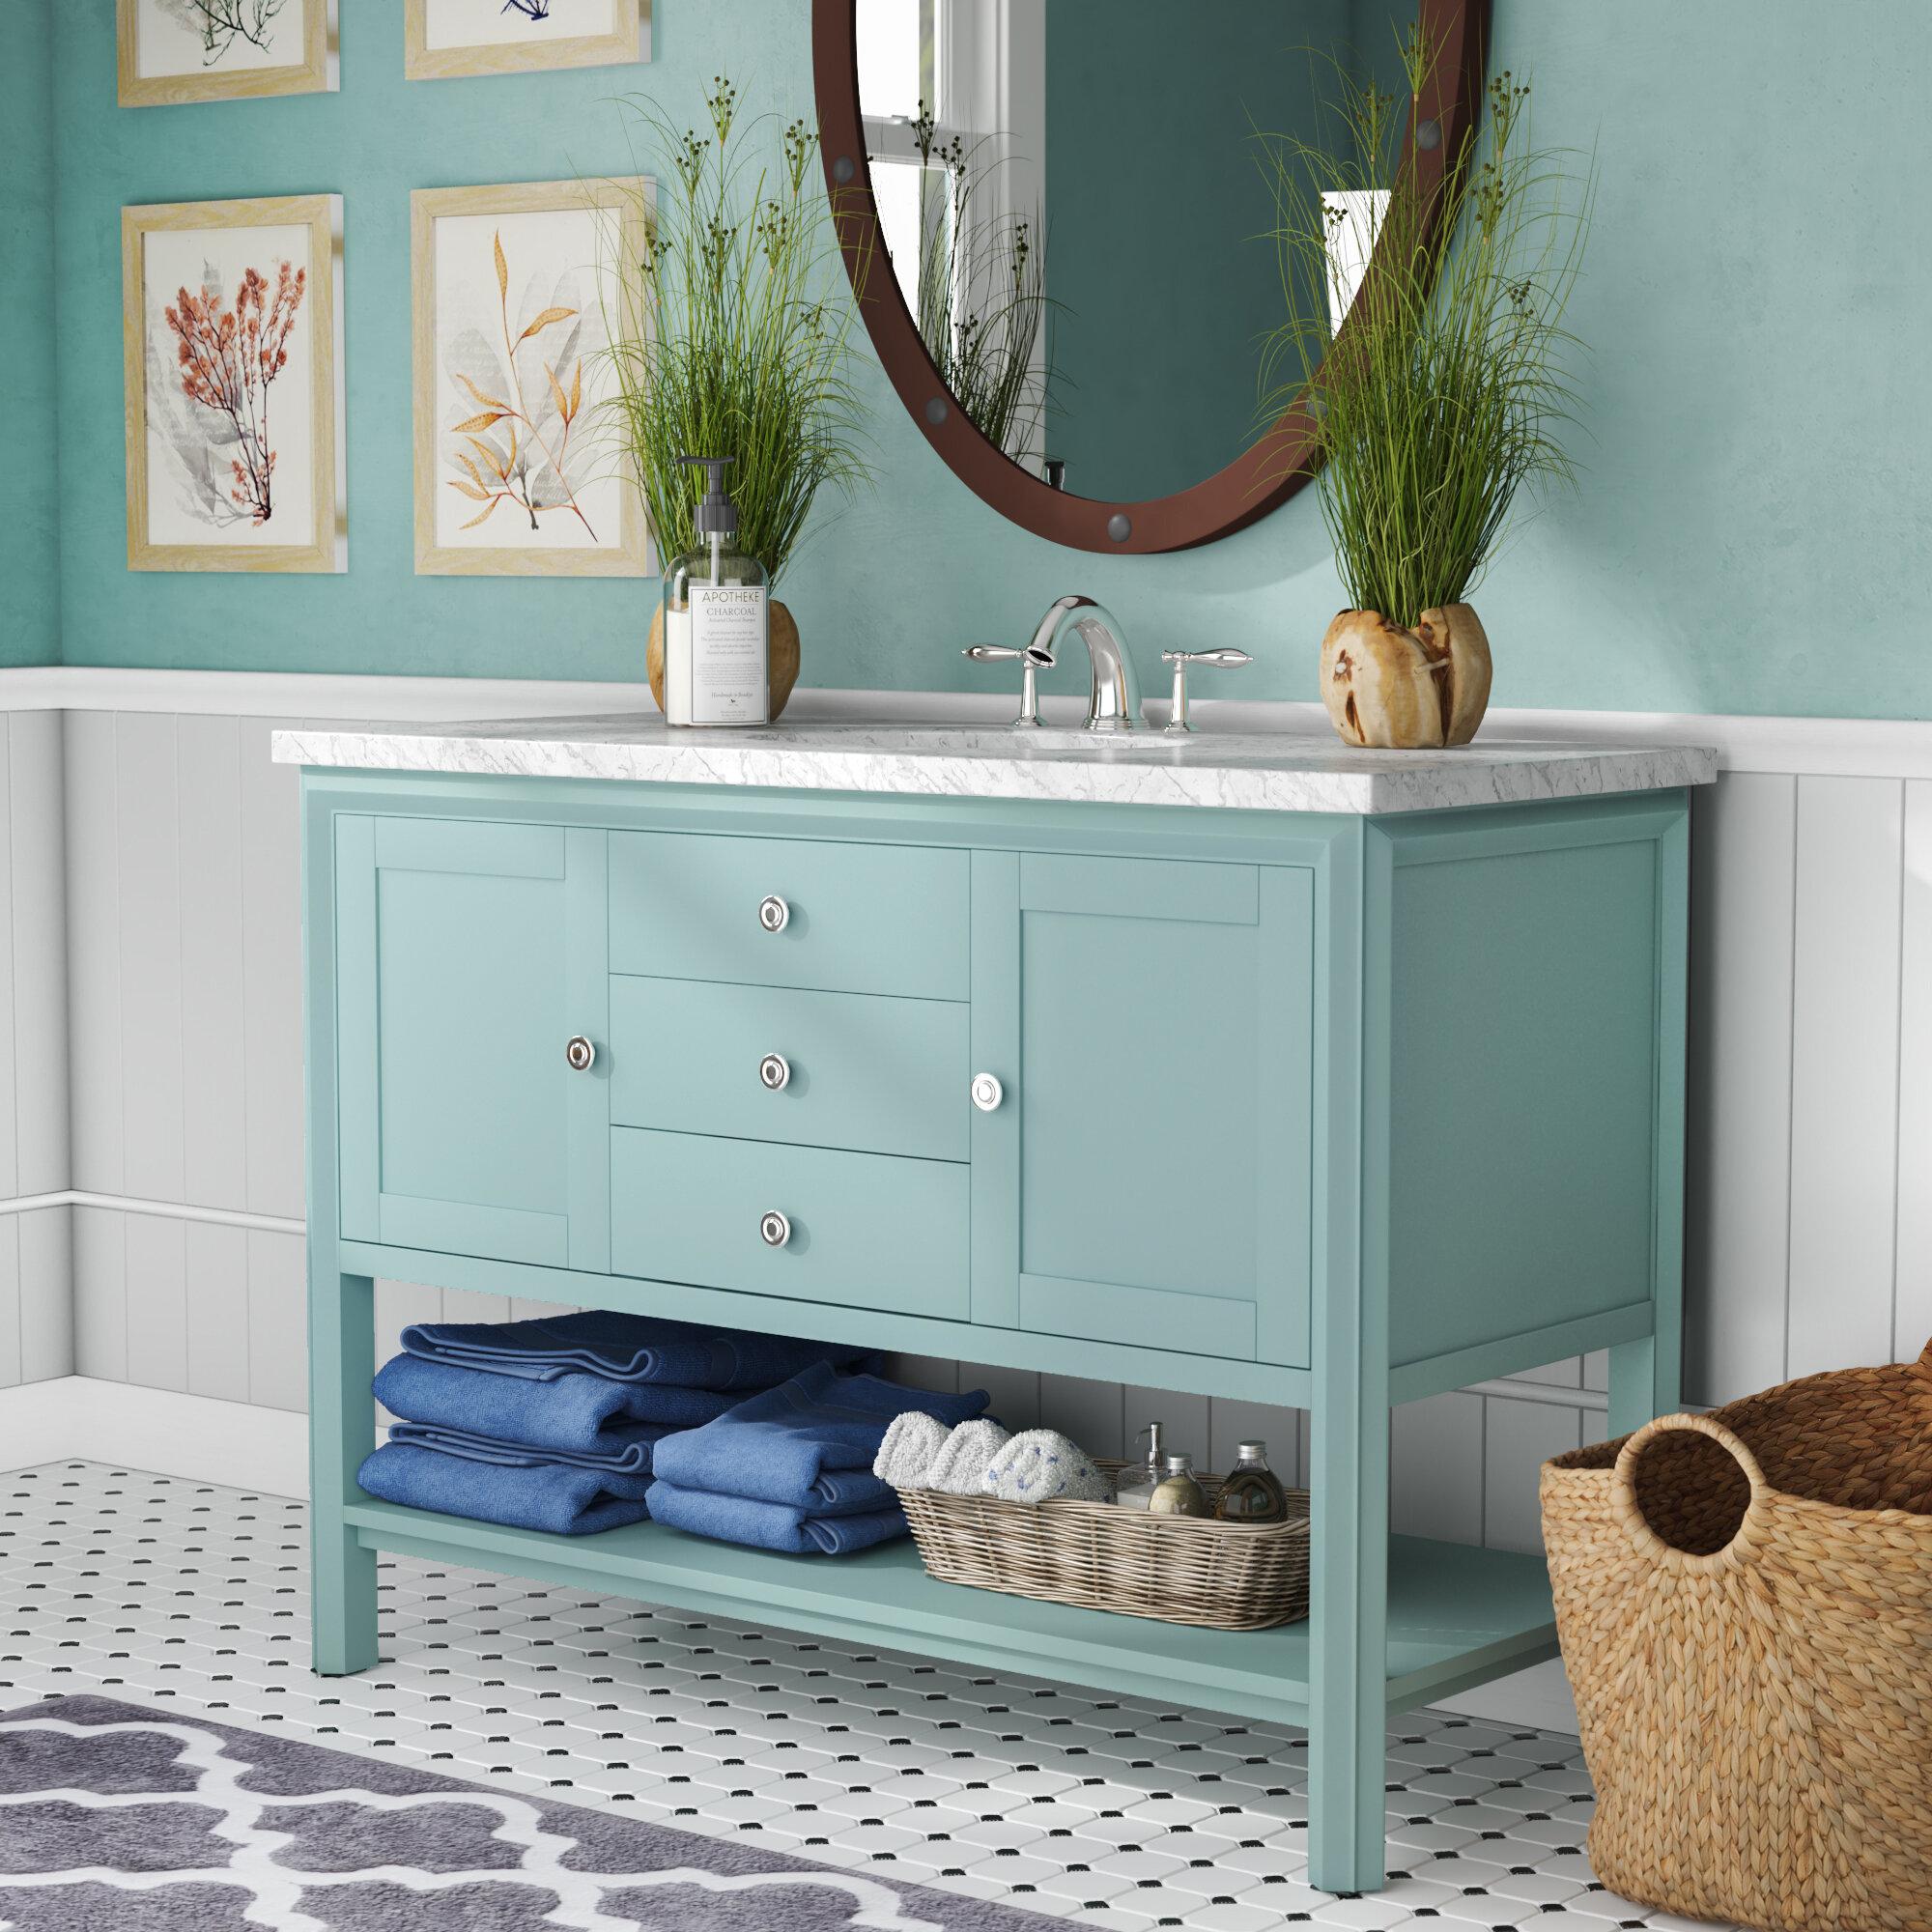 Beachcrest Home Susannah 48 Single Bathroom Vanity Set Reviews Wayfair